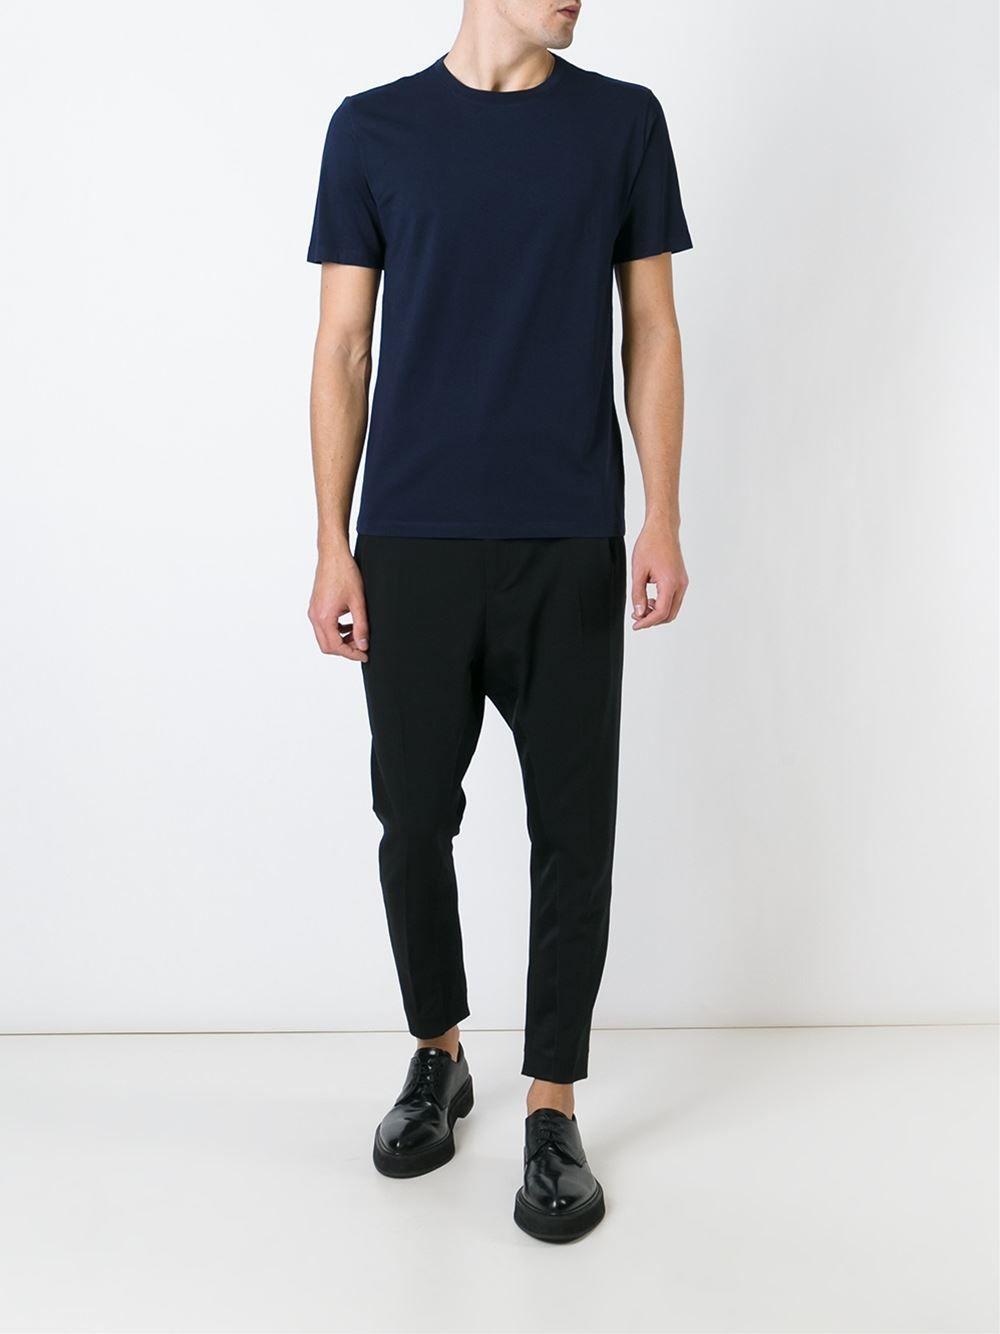 MAISON MARGIELA /// メゾンマルジェラ Round Neck T-Shirts (NAVY) ラウンドネックTシャツ ネイビー